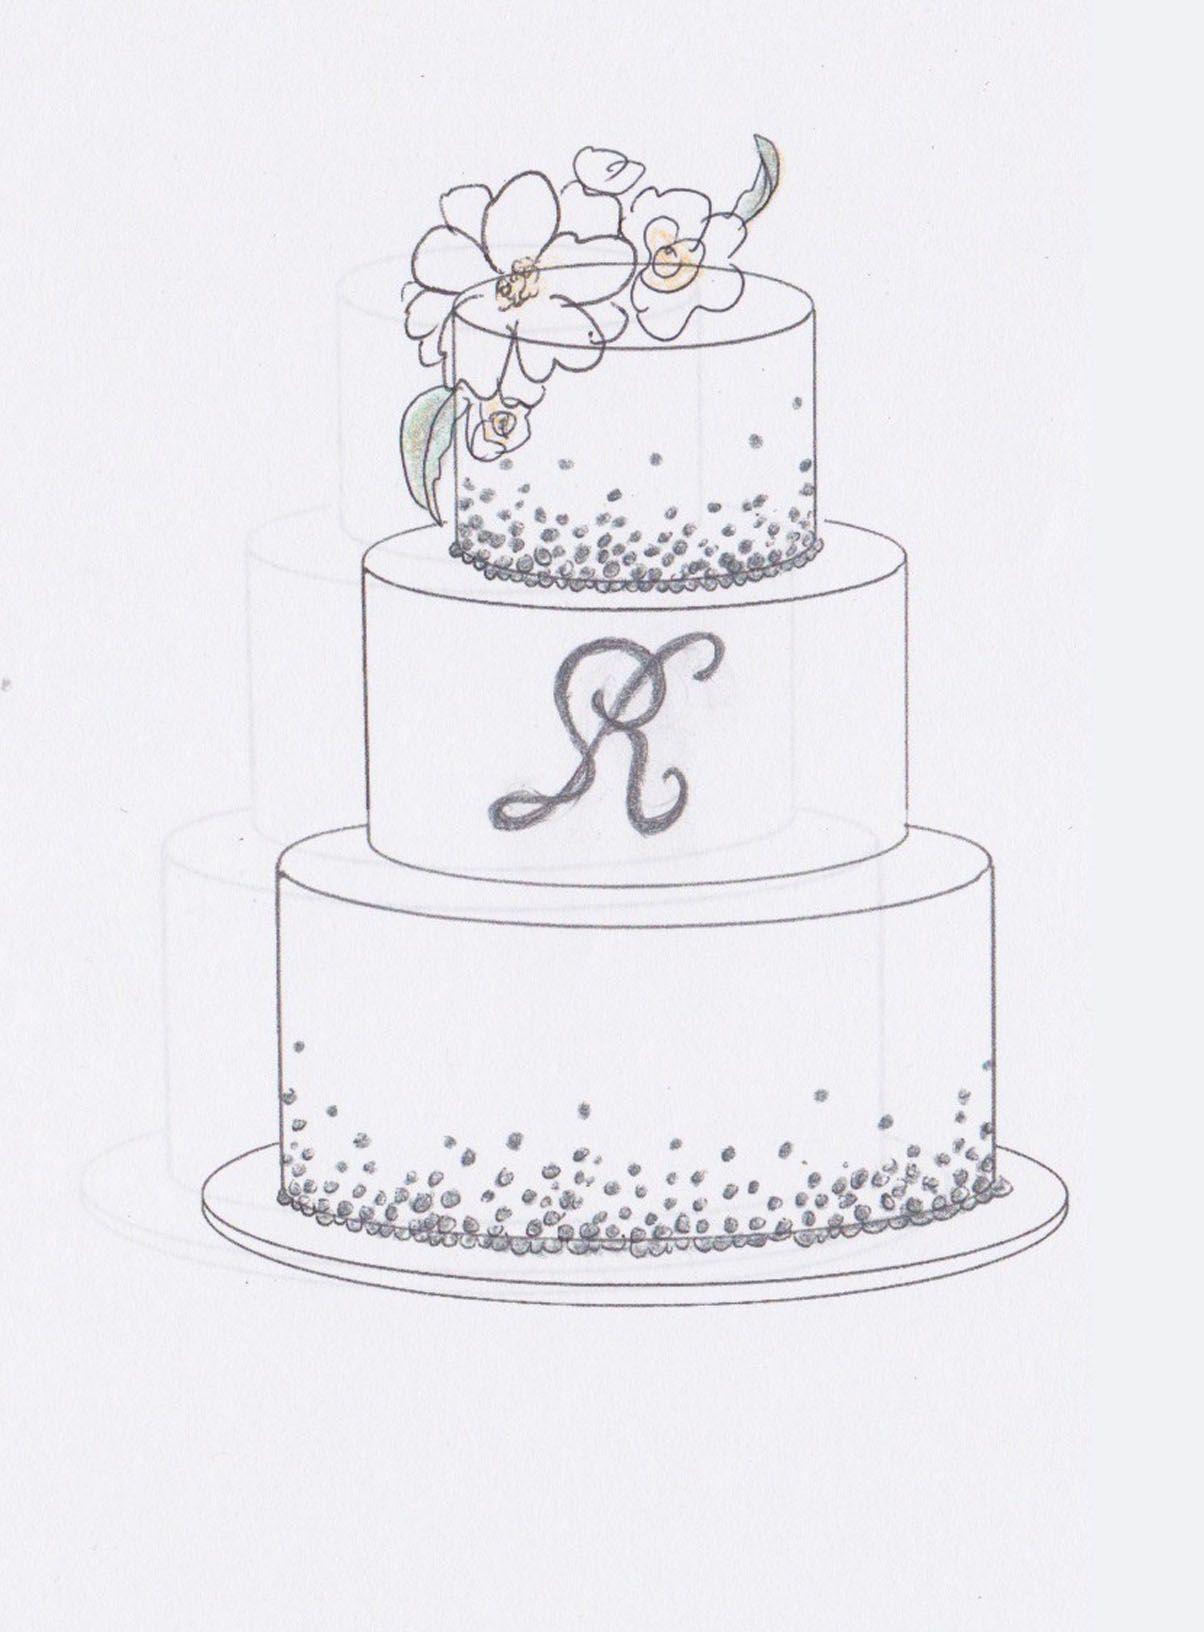 Wedding Cake Sketch Interests Mongram Tier Embellishments But Too Simple Wedding Cake Drawing Cake Drawing Cake Sketch